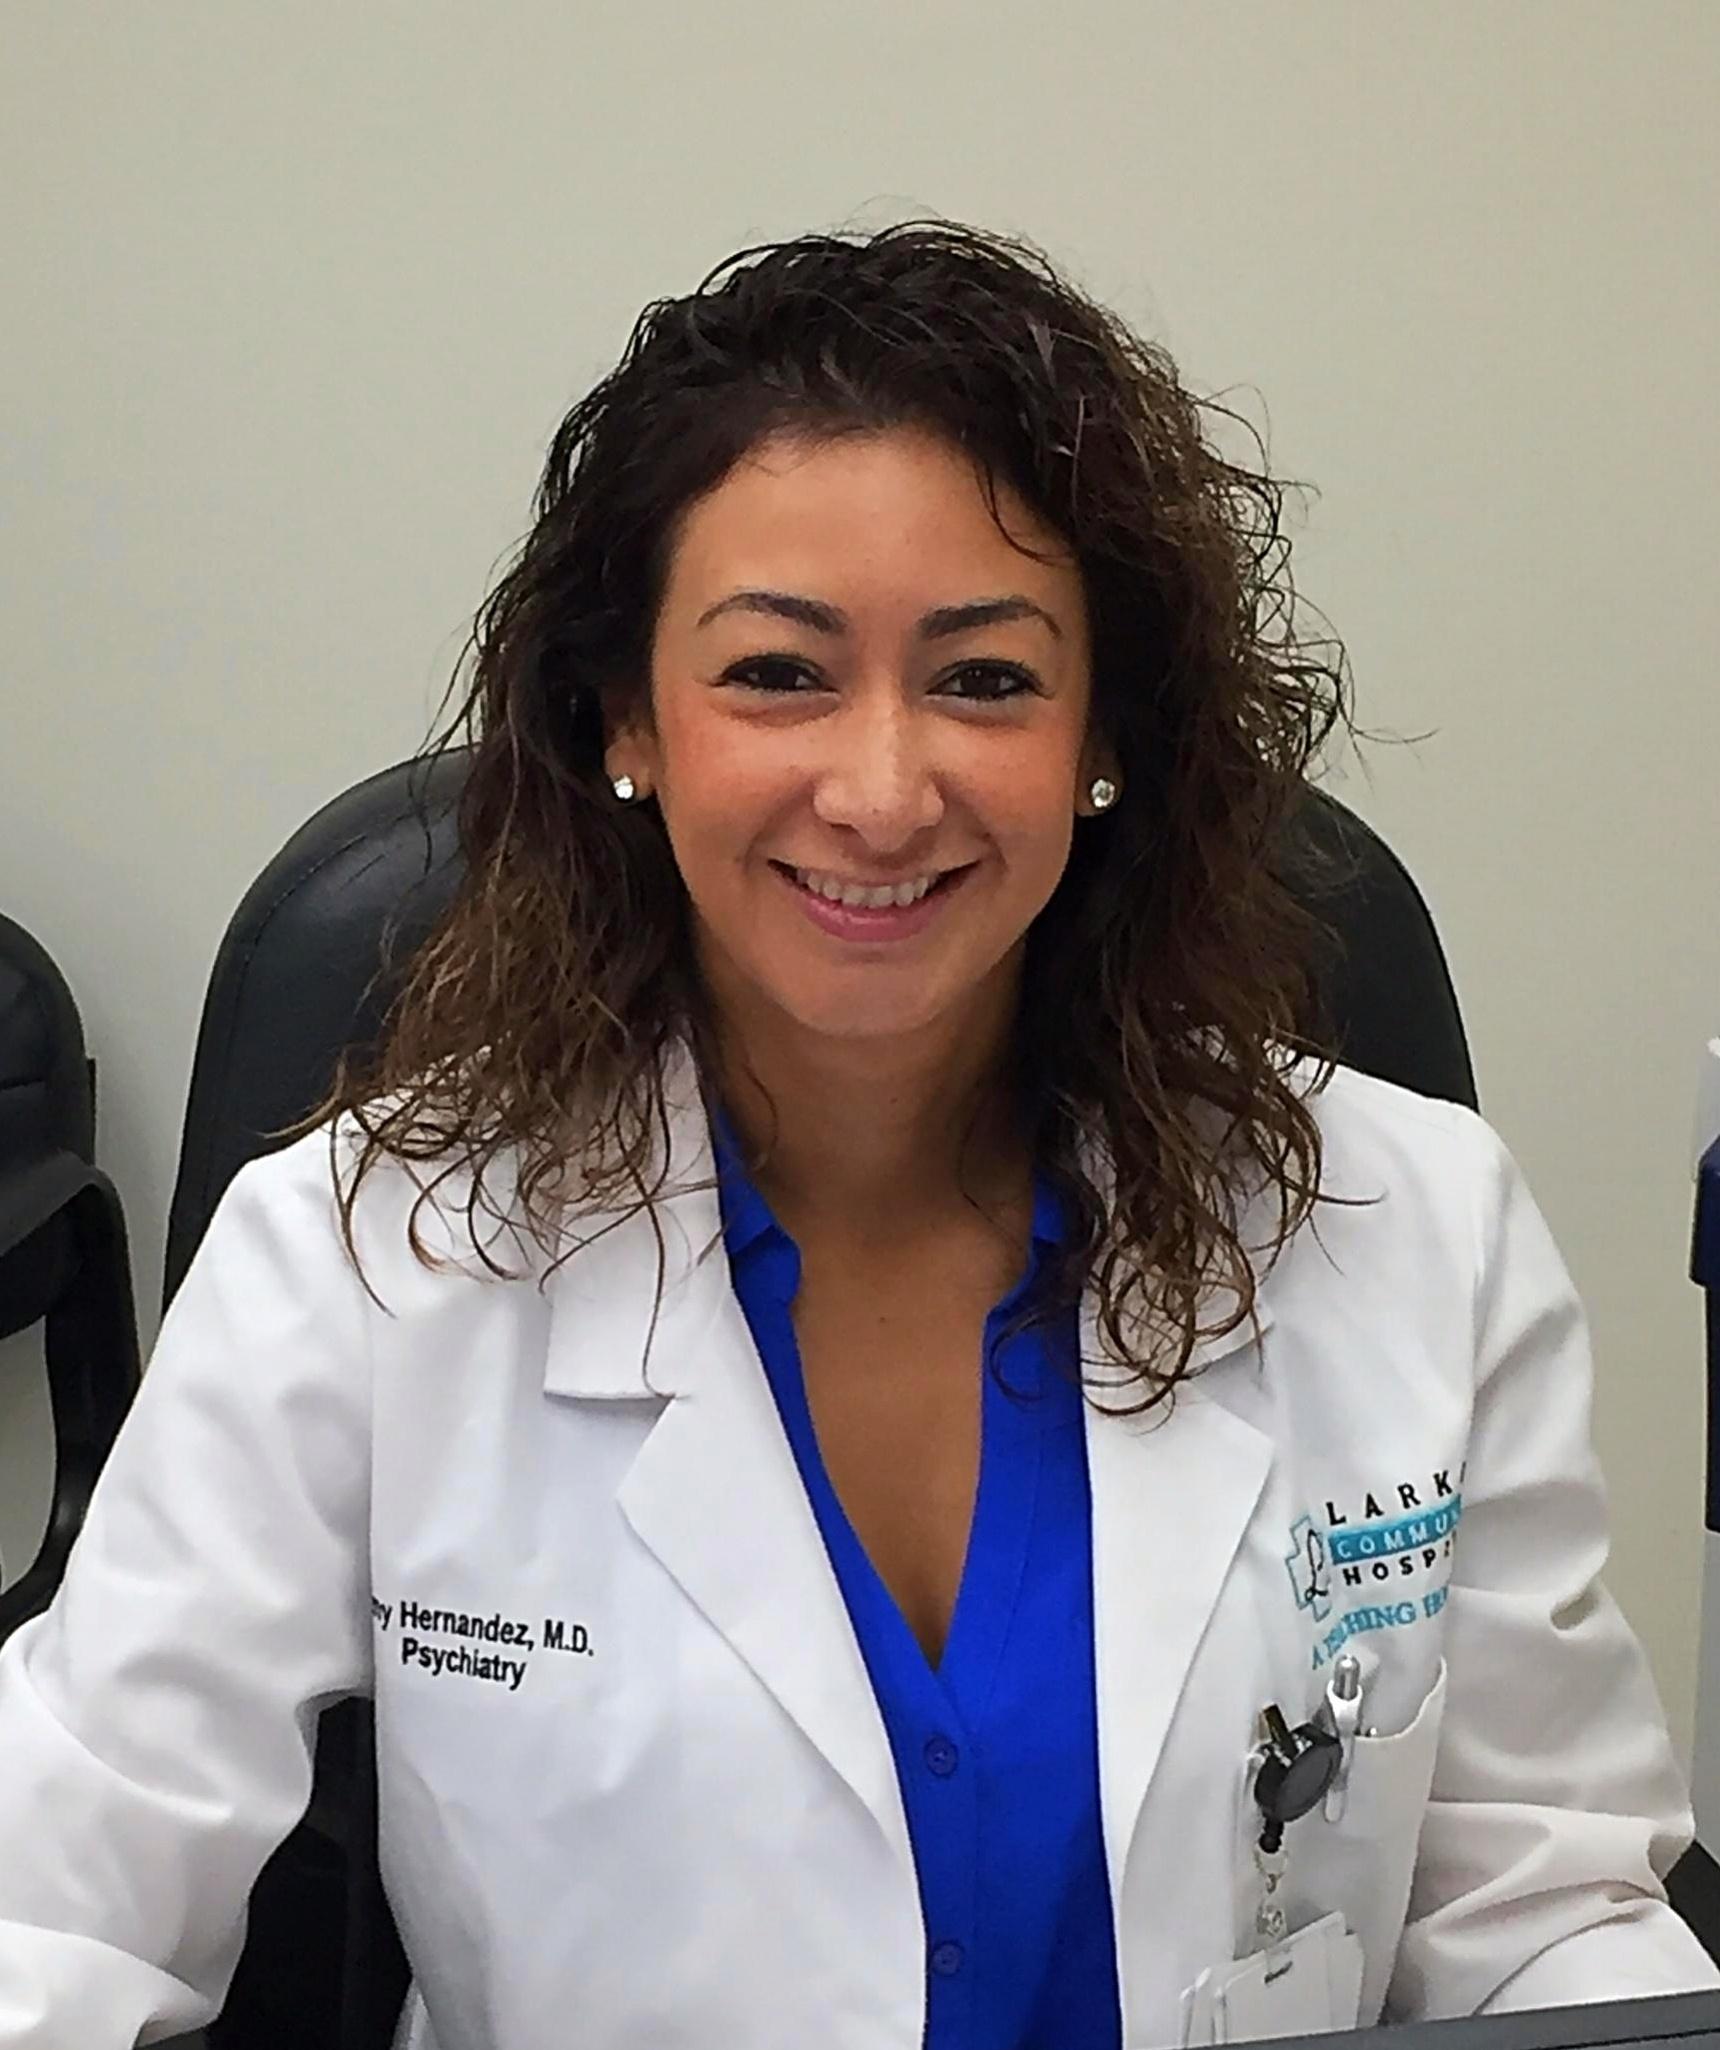 Trinity School of Medicine Alumni Spotlight: Dr. Amy Hernandez, Trinity Class of 2012